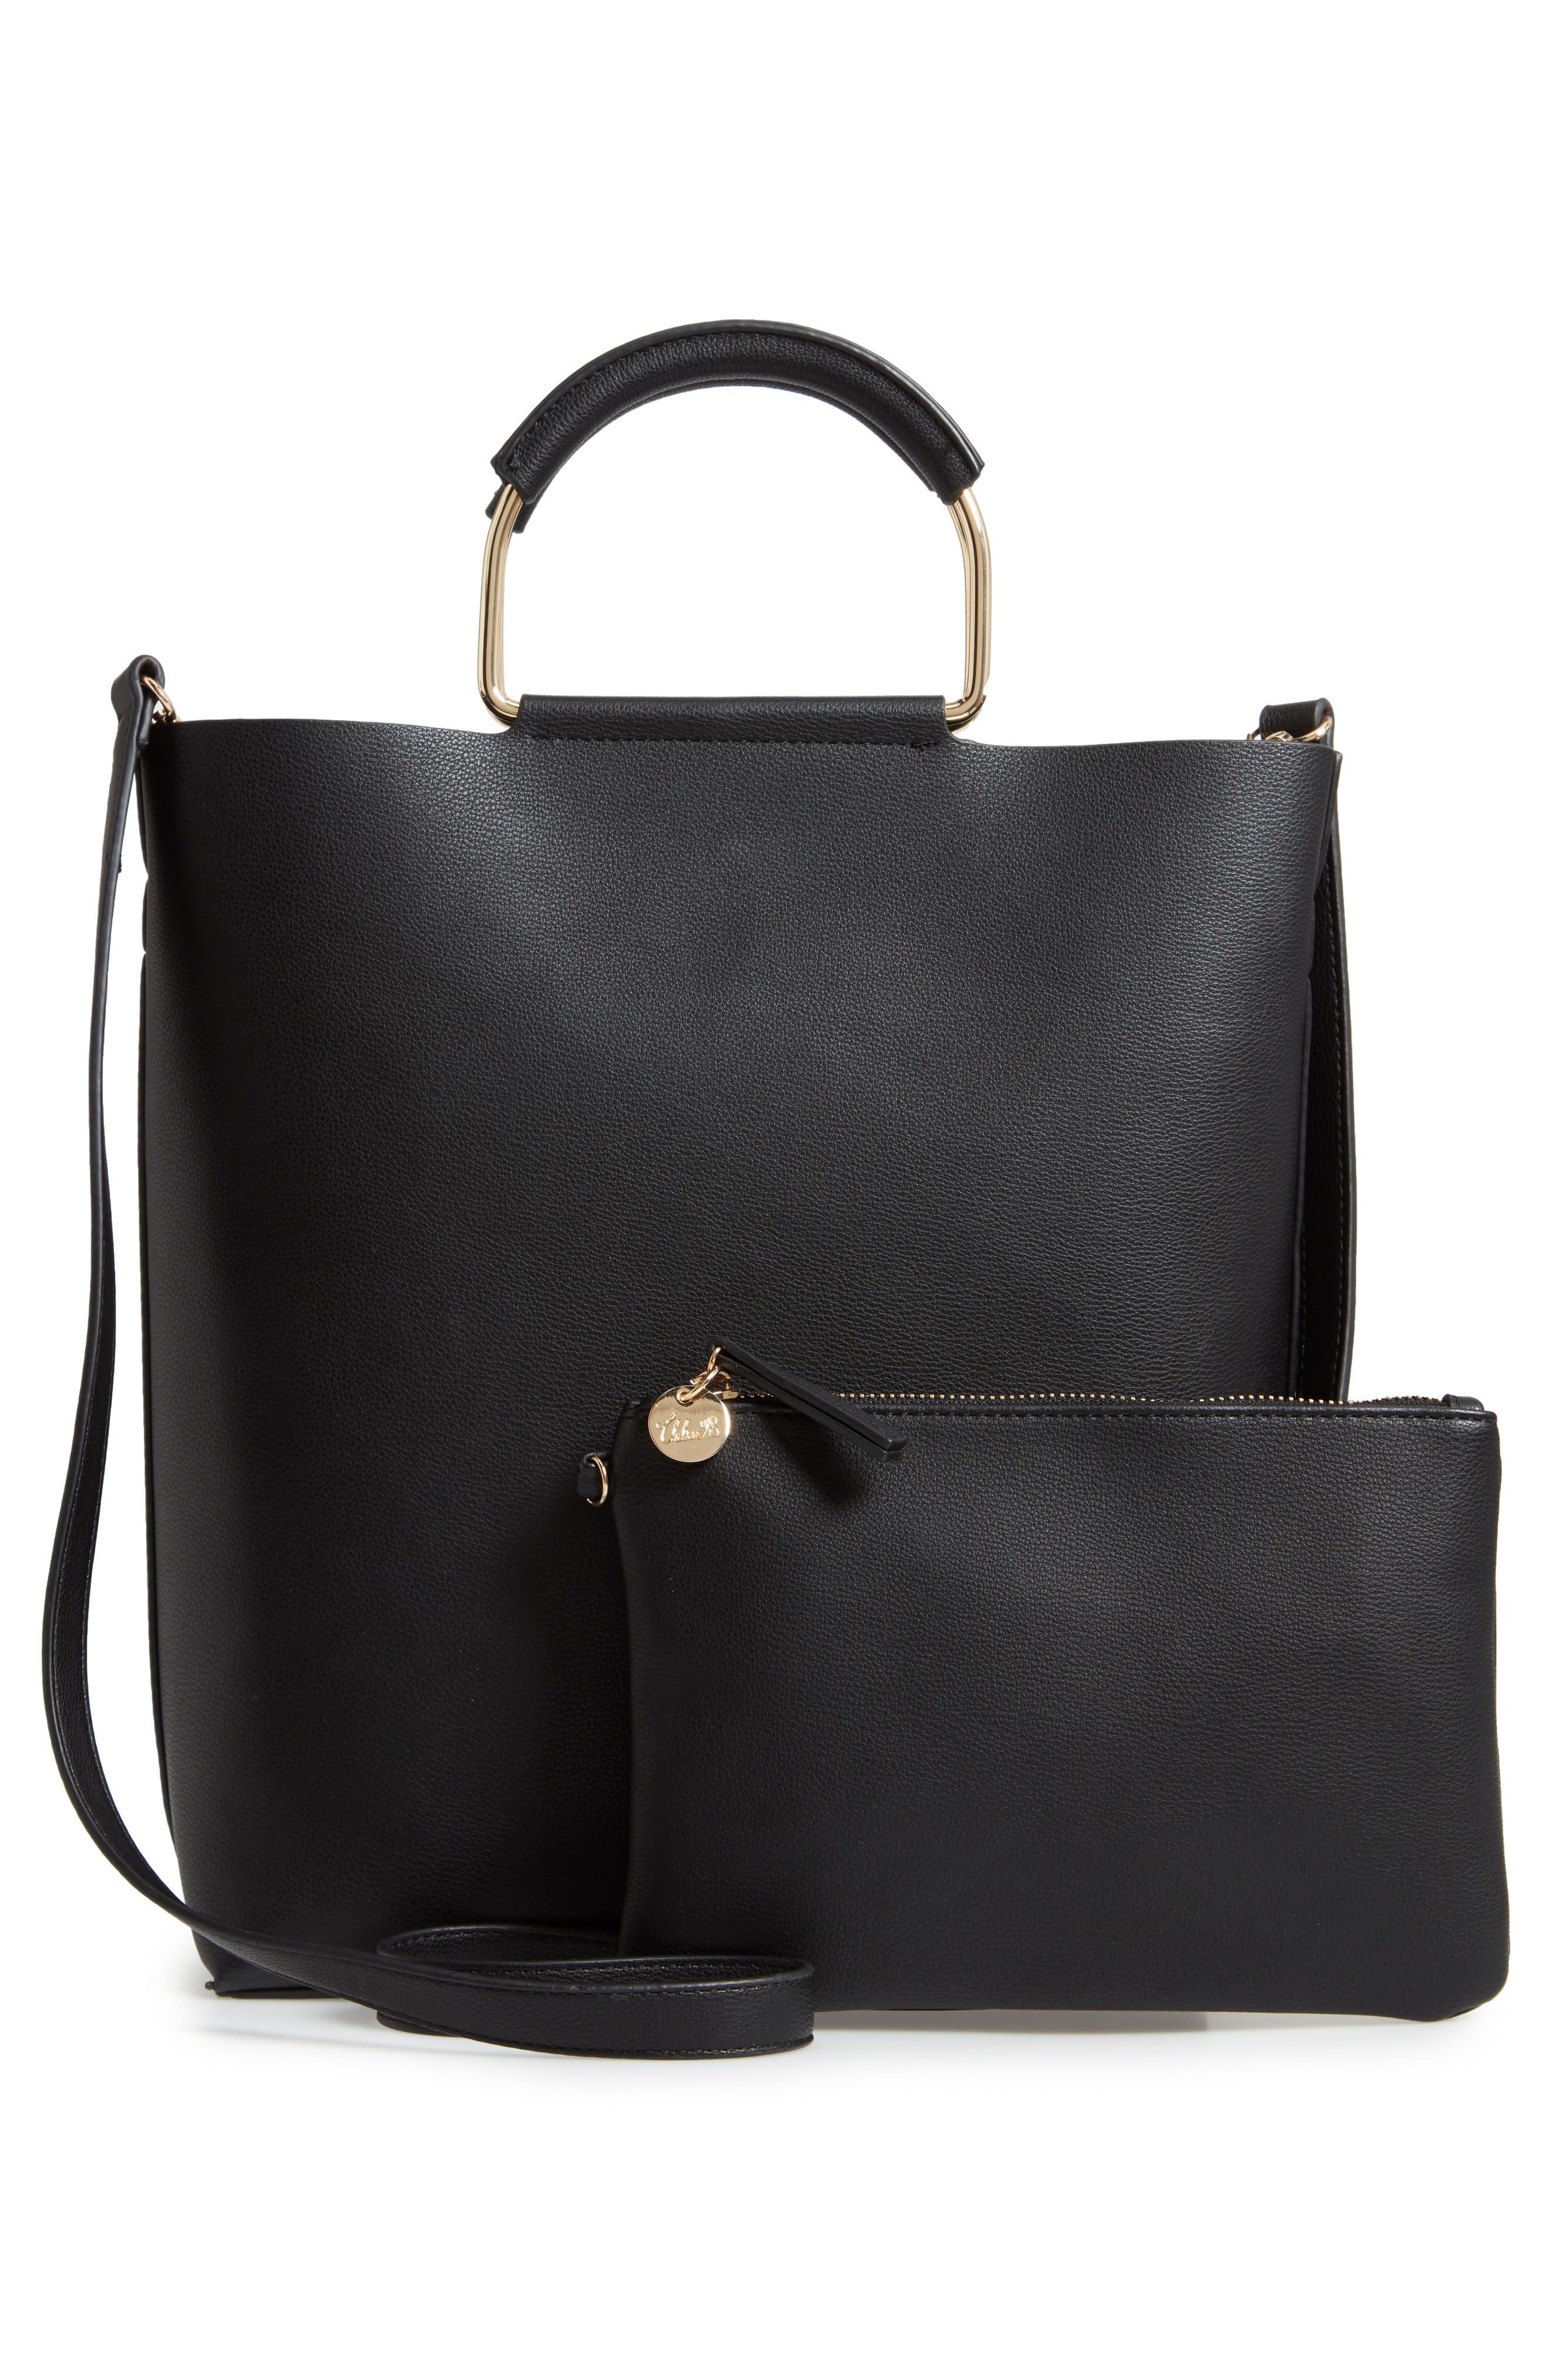 CHELSEA28, Payton Convertible Faux Leather Tote, Alternate thumbnail 4, color, BLACK